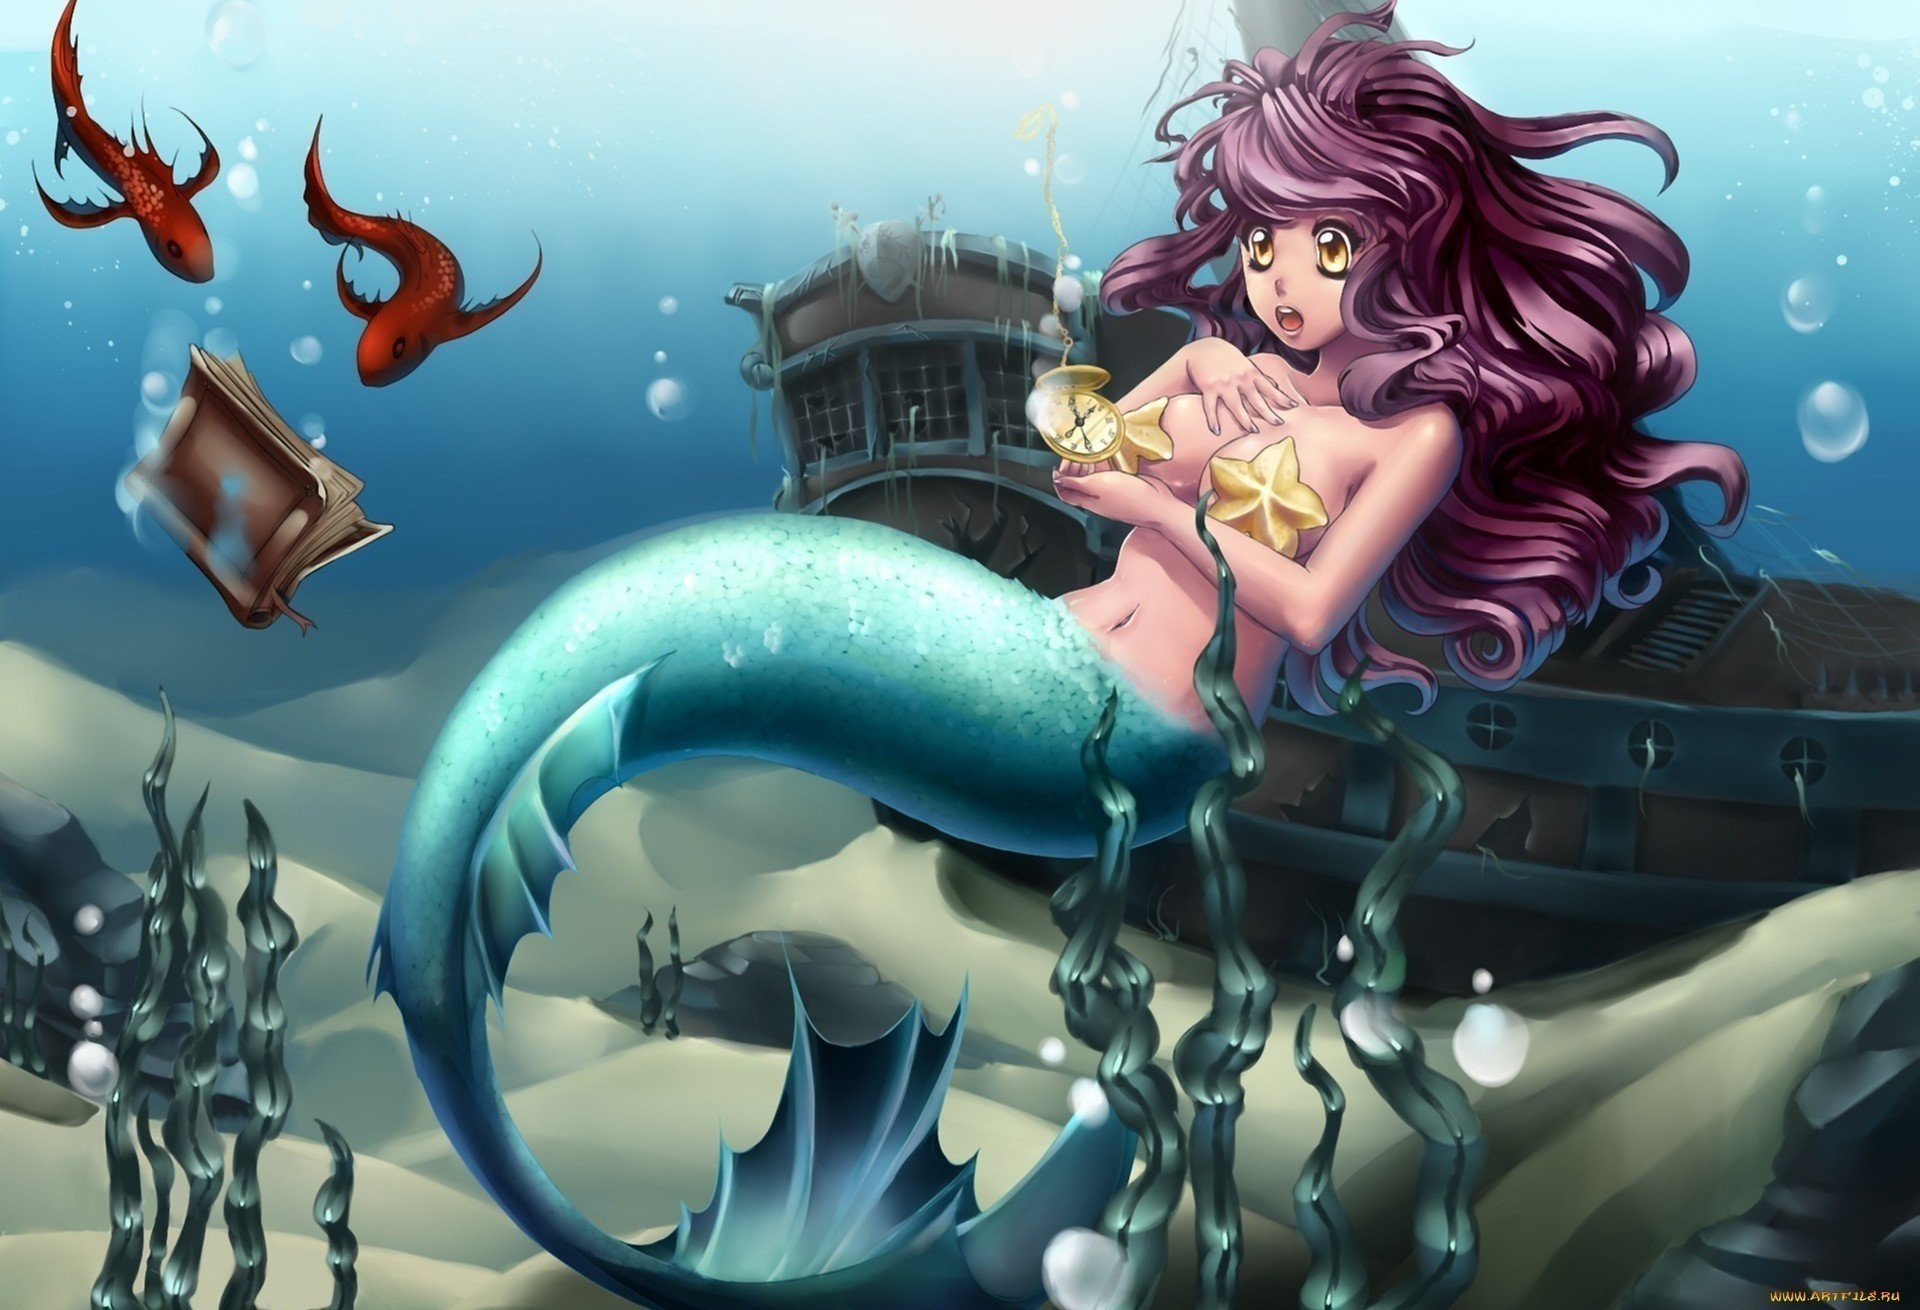 фэнтези русалка графика рисунок fantasy mermaid graphics figure без смс